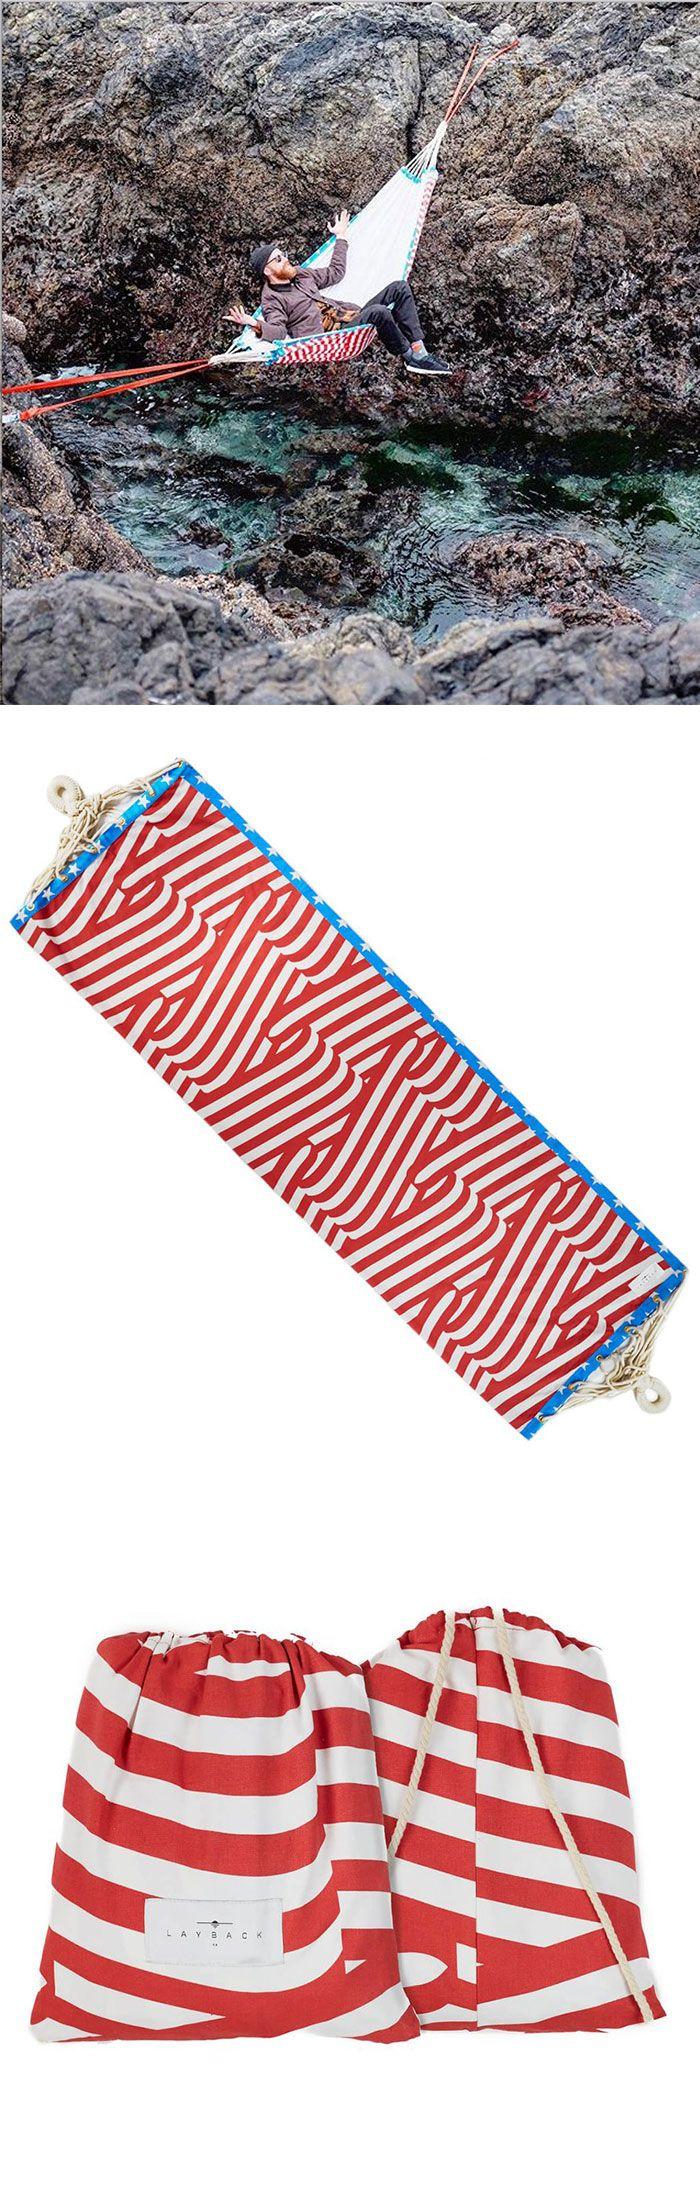 freedom  u0026 hammocks go hand in hand  save 30  this 4th of july on the american flag hammock 10 best layback co hammocks images on pinterest   hammock      rh   pinterest